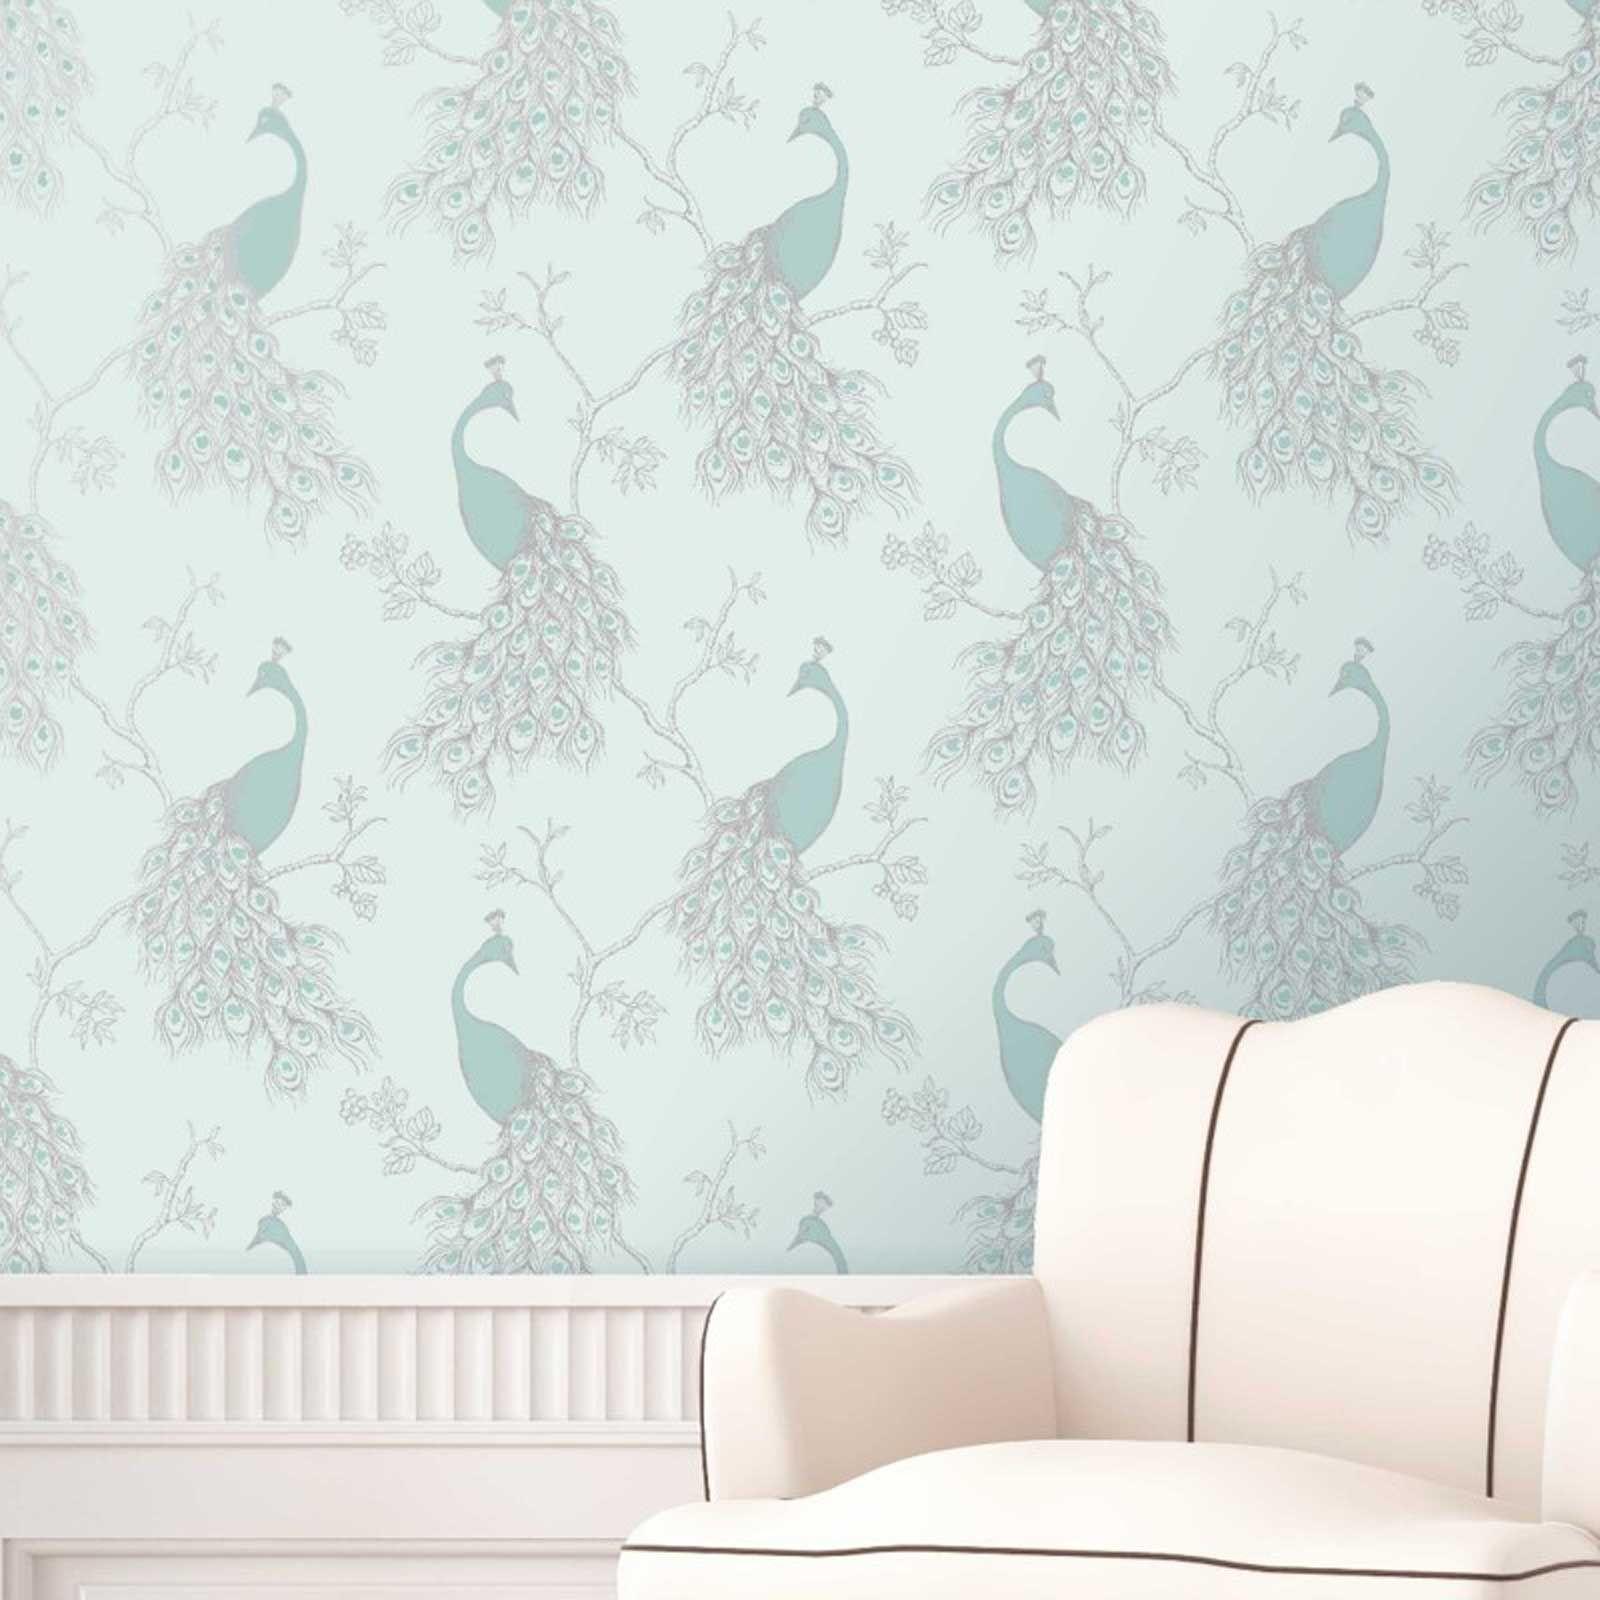 Teal Duck Egg Green Wallpaper Geometric Floral Birds - Duck Egg Blue And Grey - HD Wallpaper